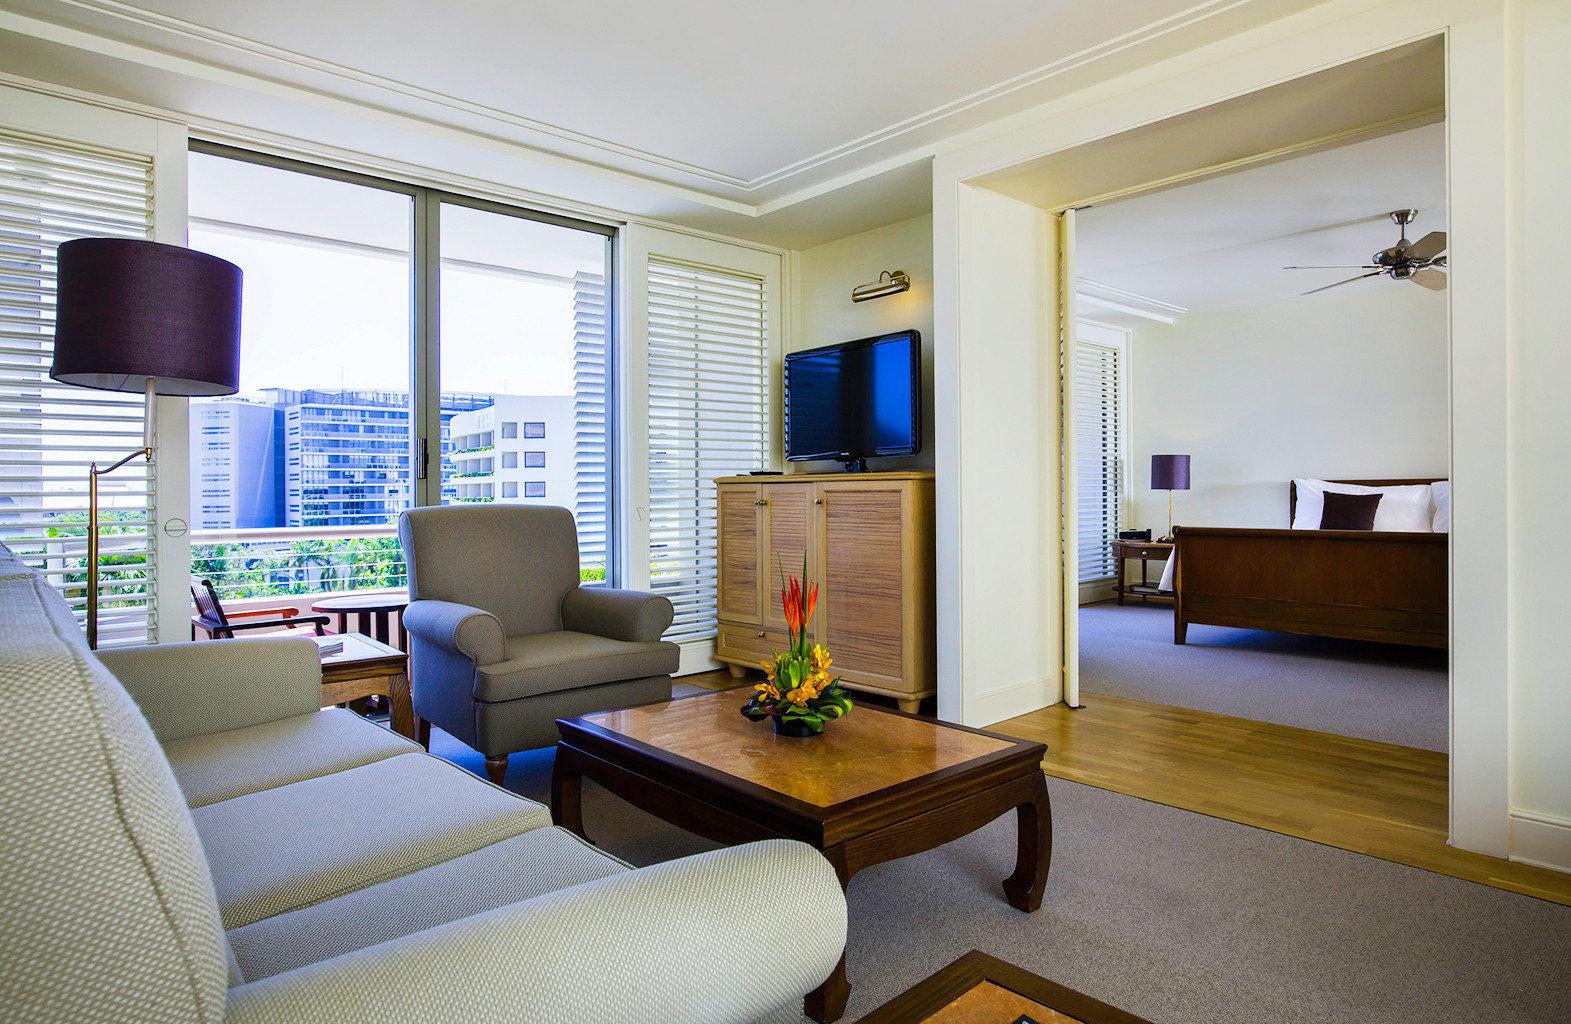 Bedroom Resort Scenic views property living room condominium home house Suite cottage